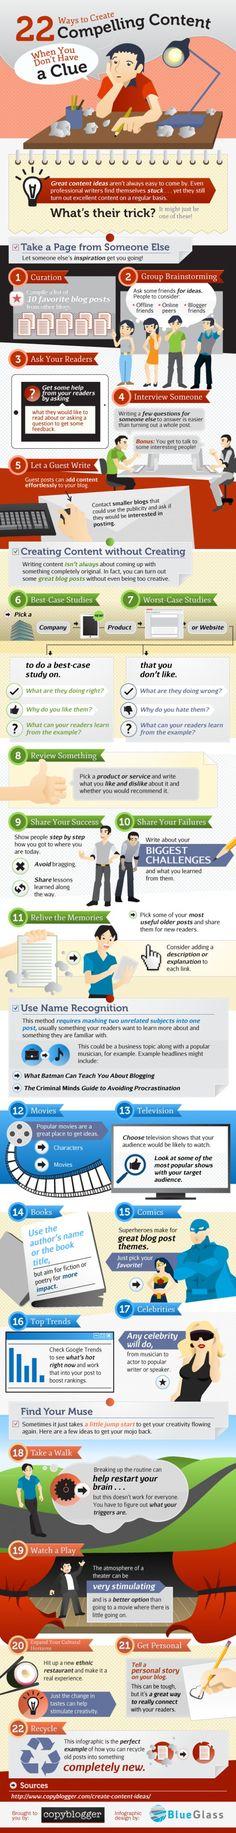 22 Ways to Create Co